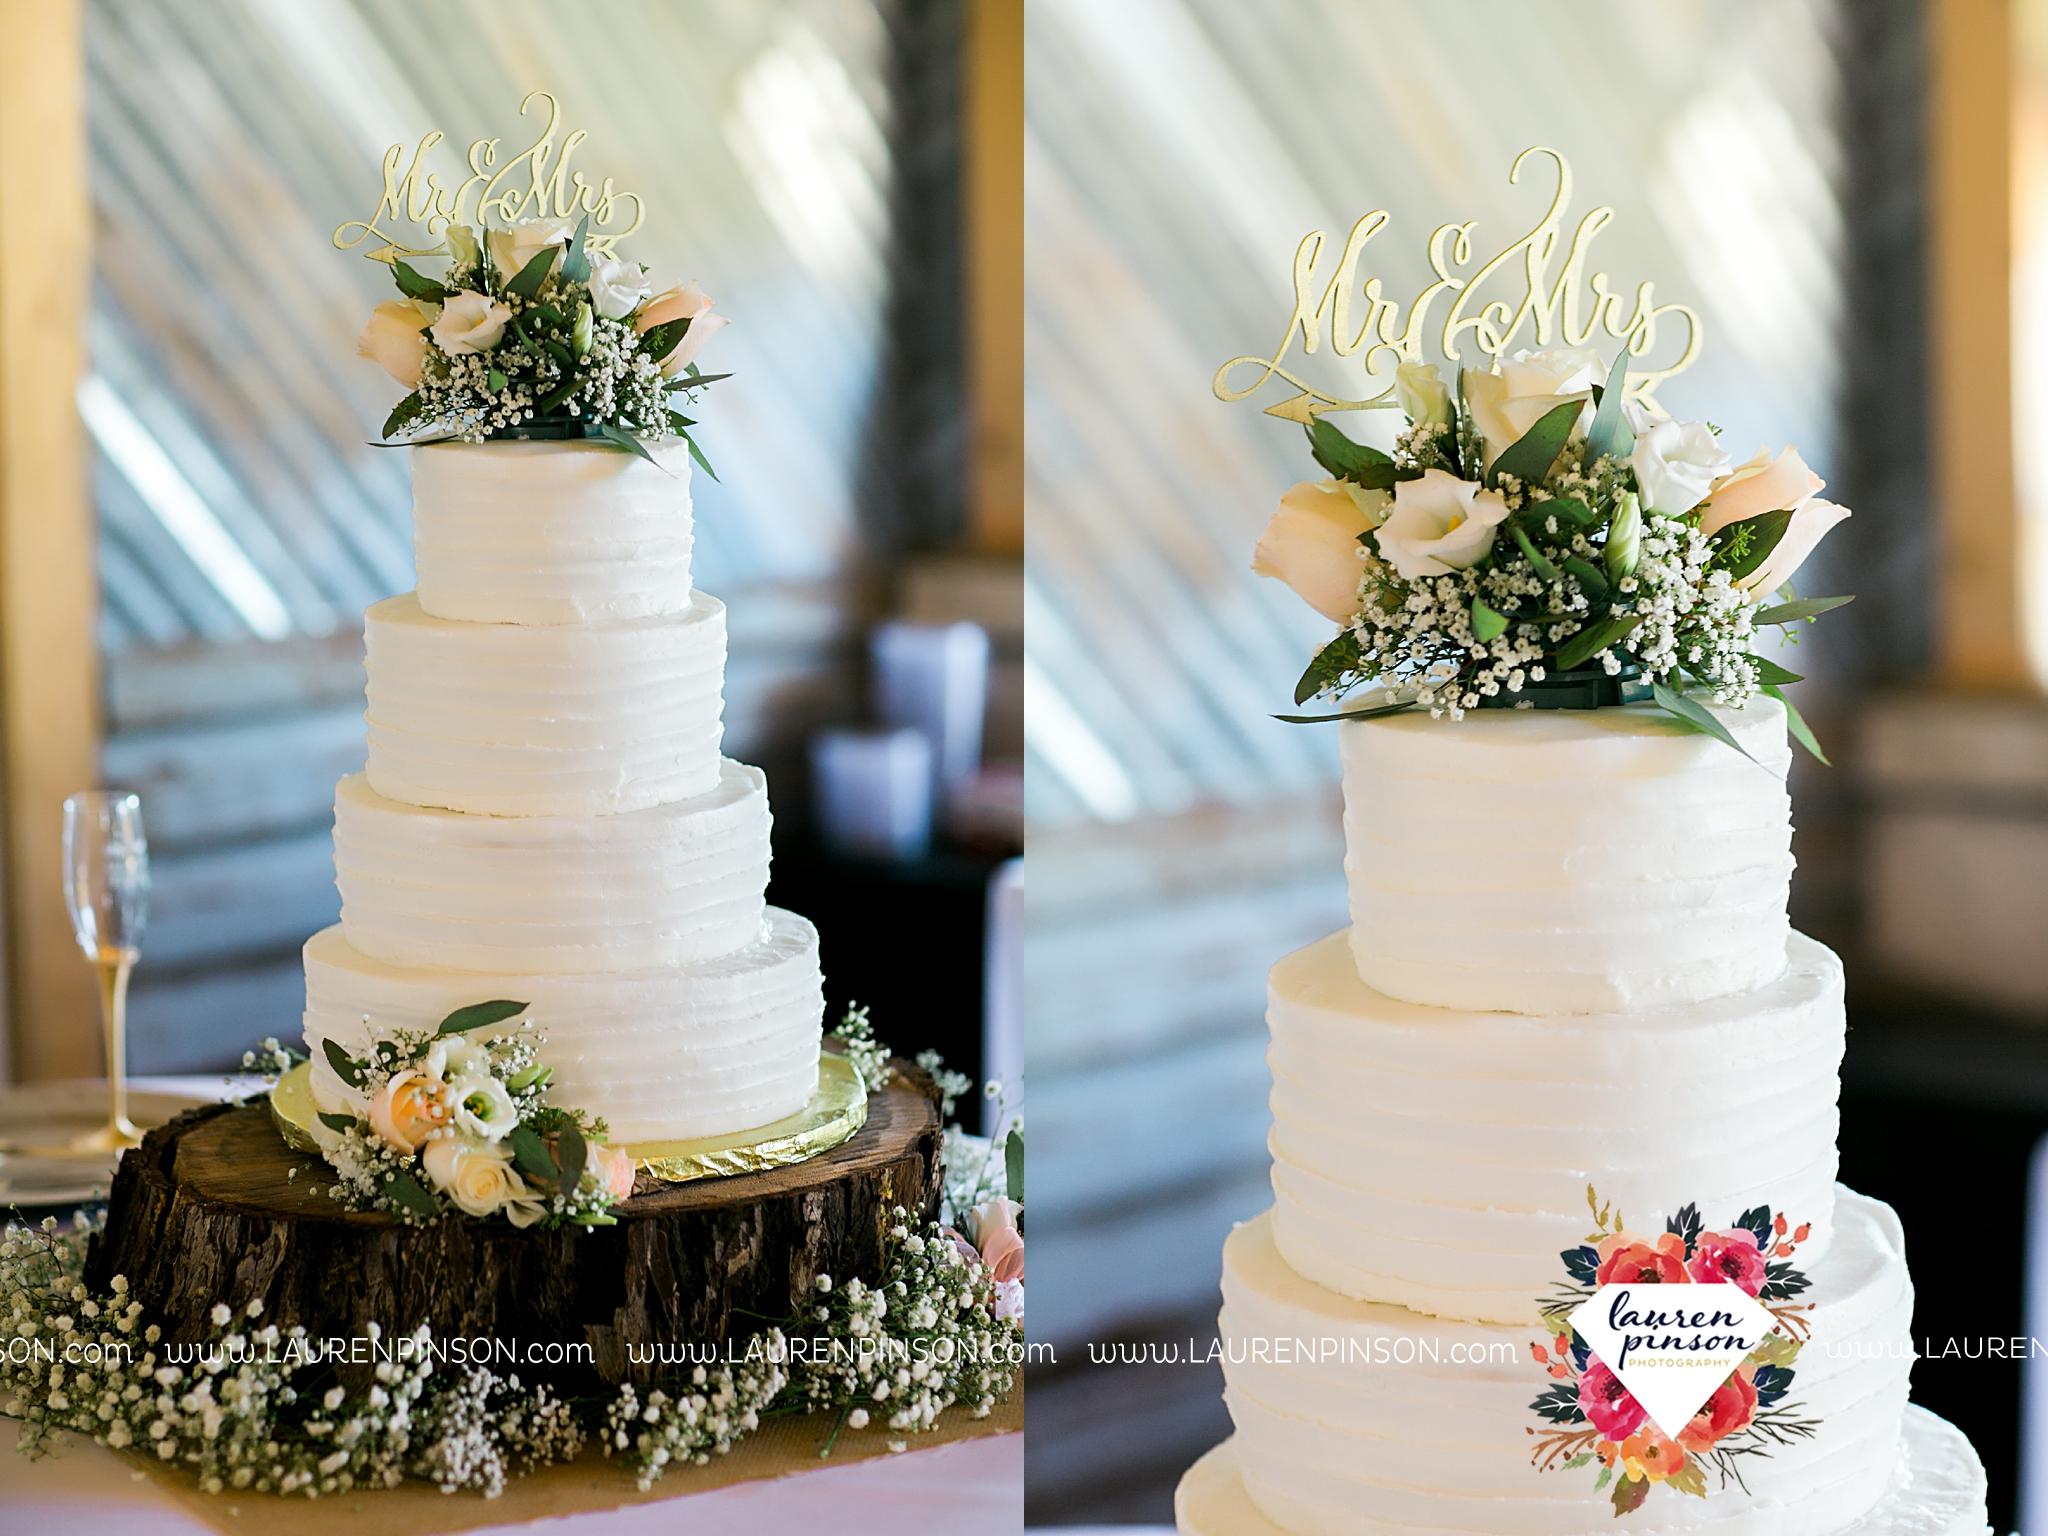 jones-barn-willow-creek-ranch-wedding-in-cleburne-texas-fort-worth-dfw-wichita-falls-wedding-photography_3258.jpg